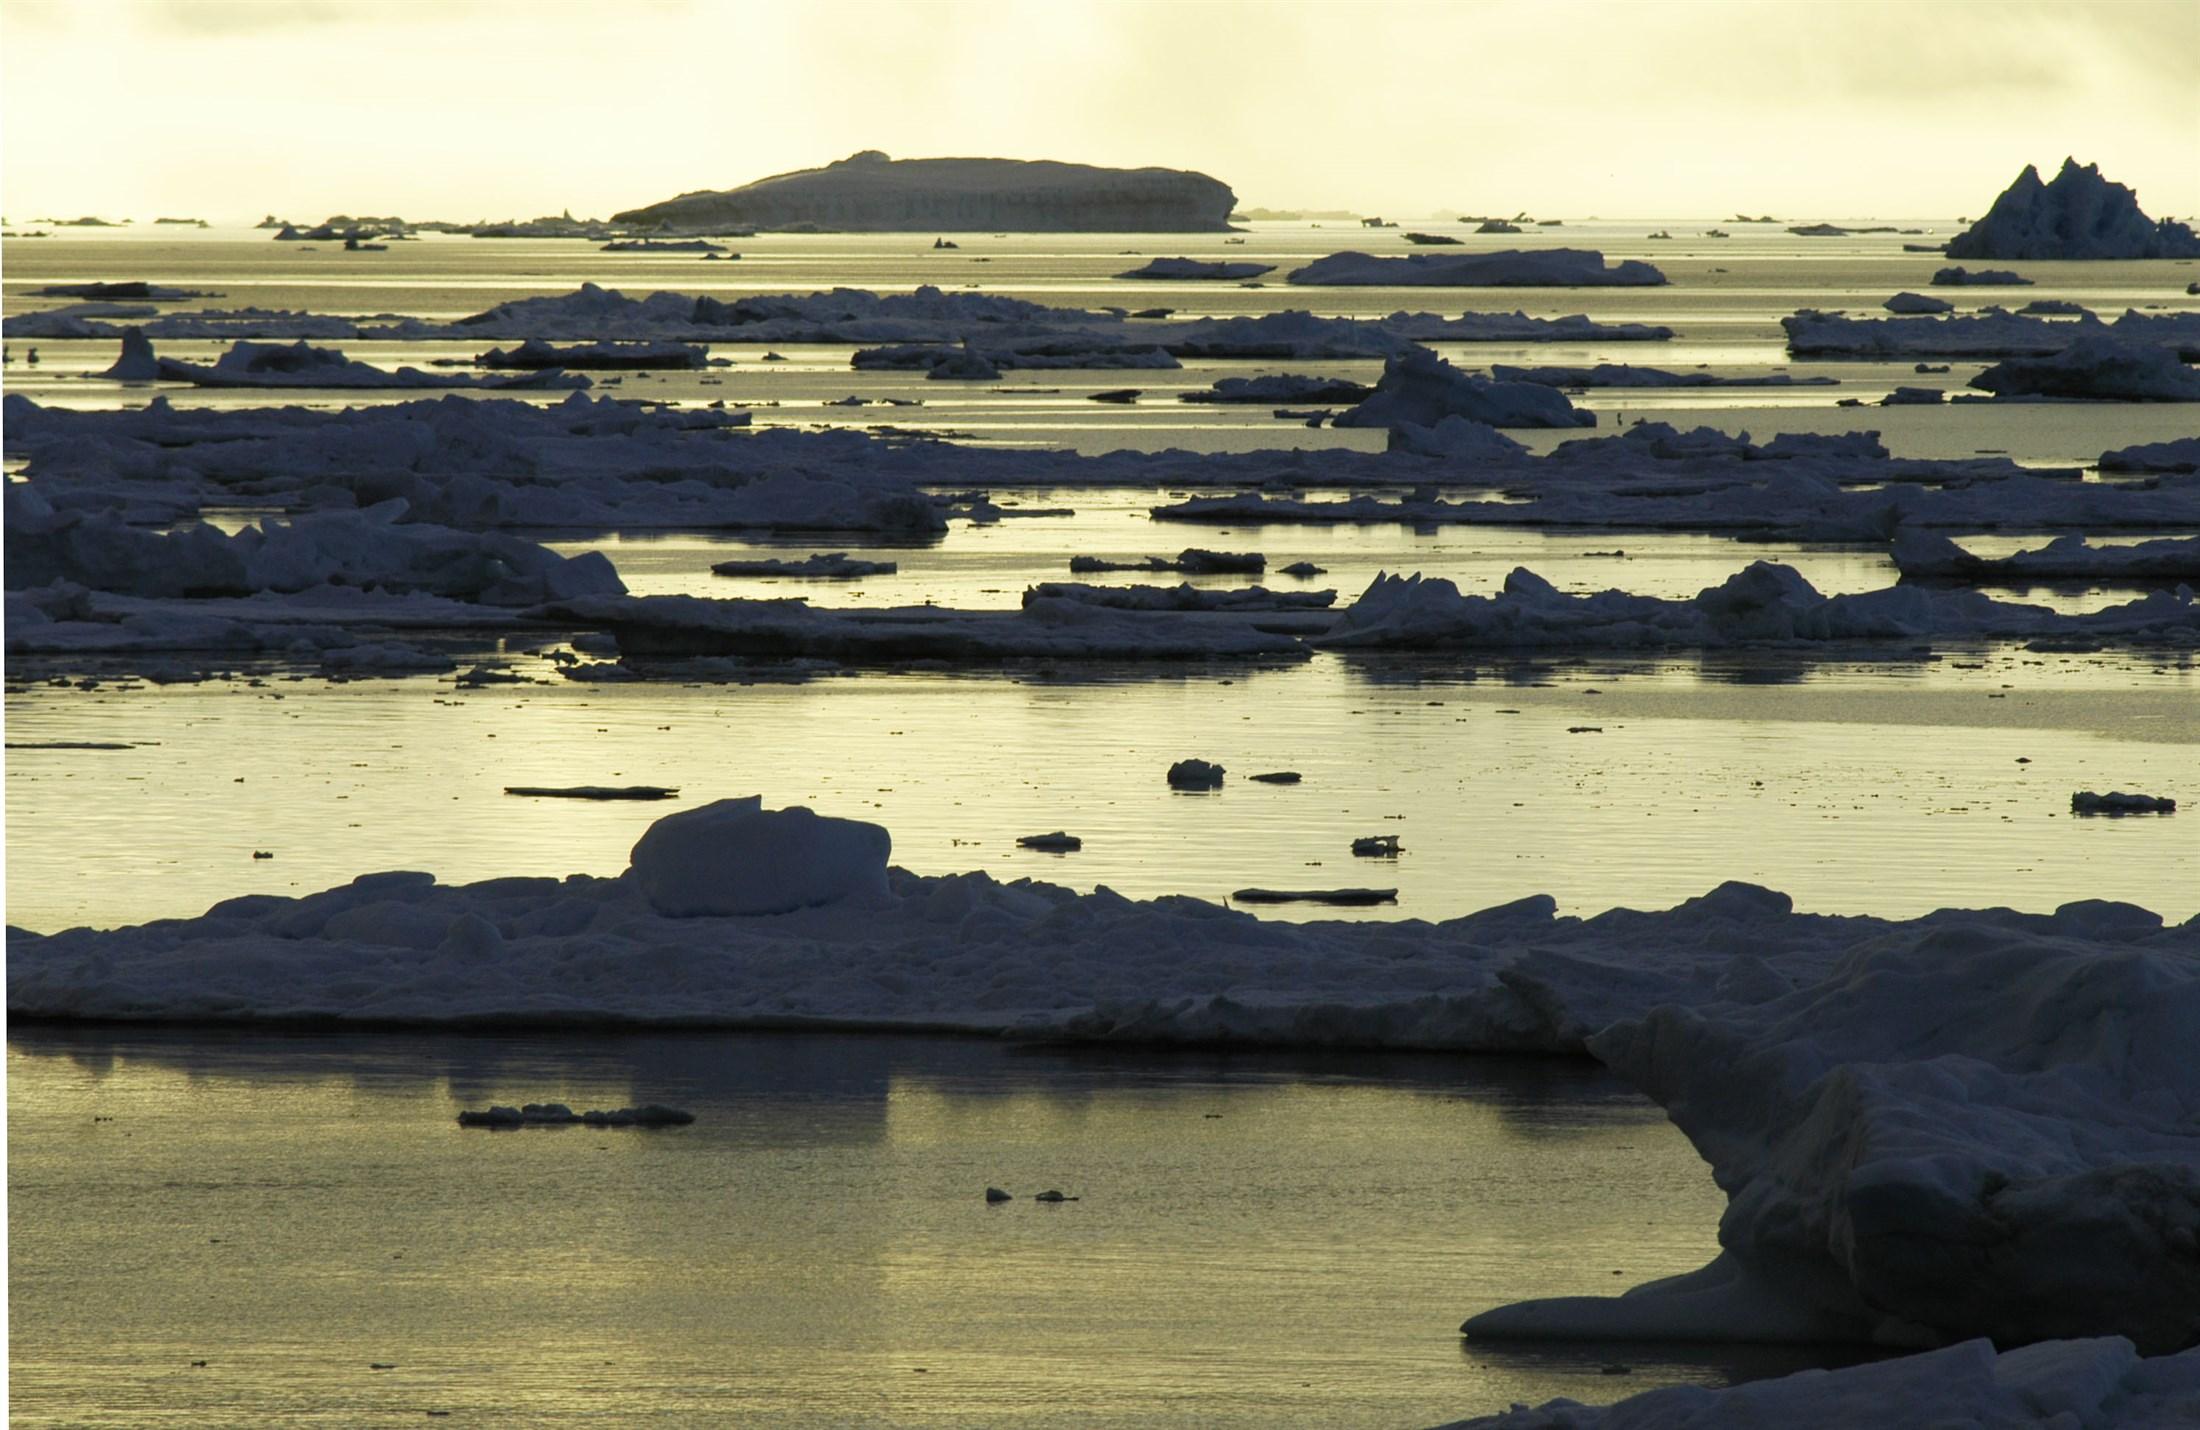 icebergs-antarctic-peninsula_869e-2200x1430px